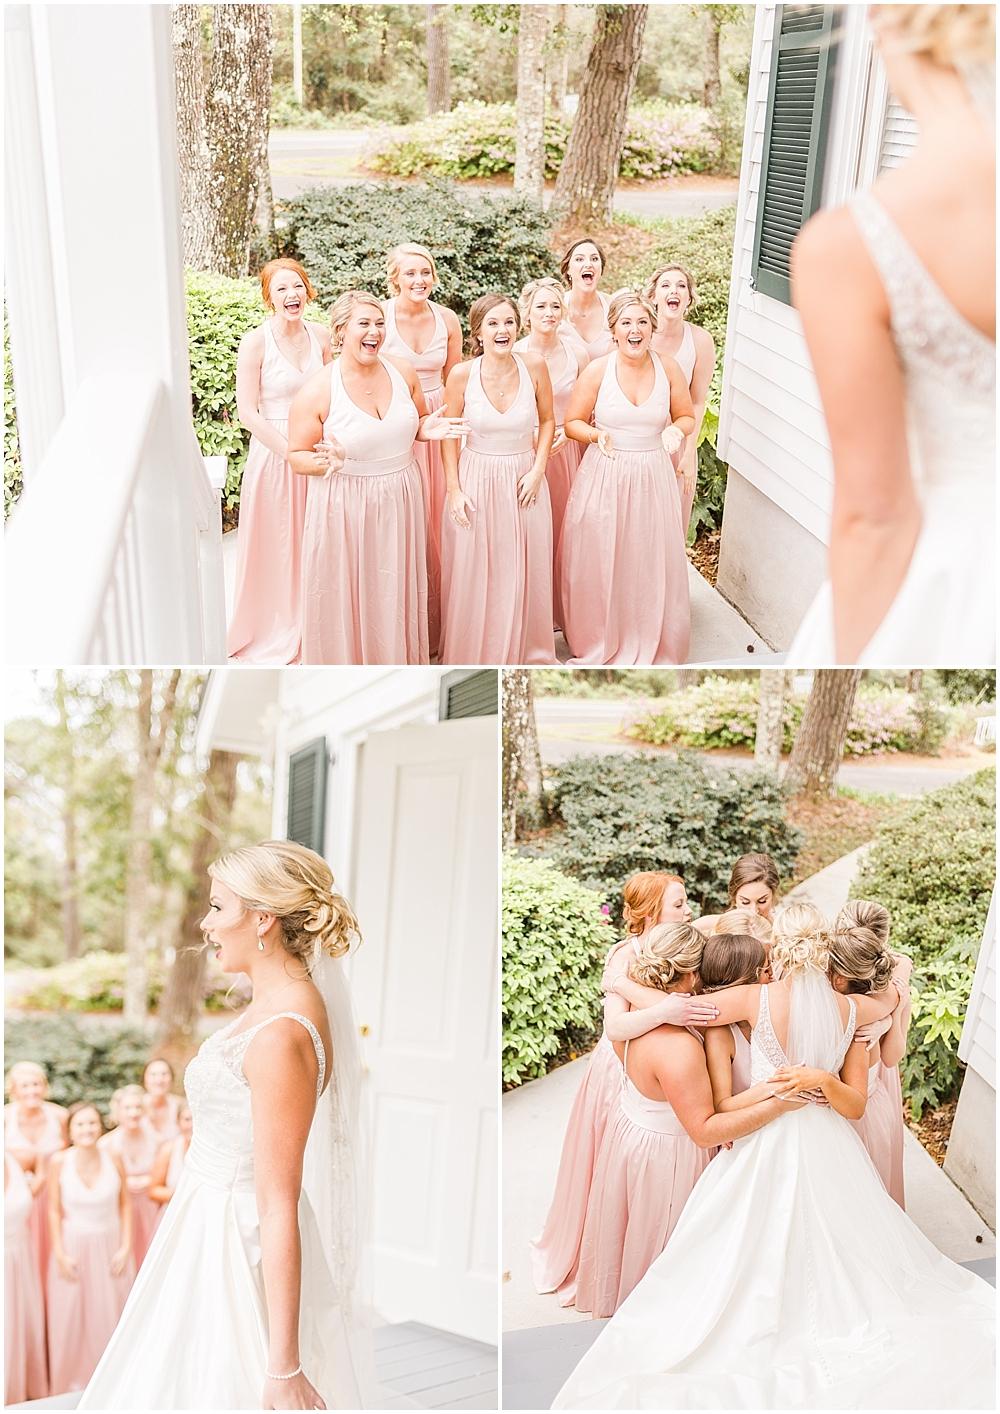 Ashton-Clark-Photography-Wedding-Portrait-Family-Photographer-Mobile-Alabama_0299.jpg